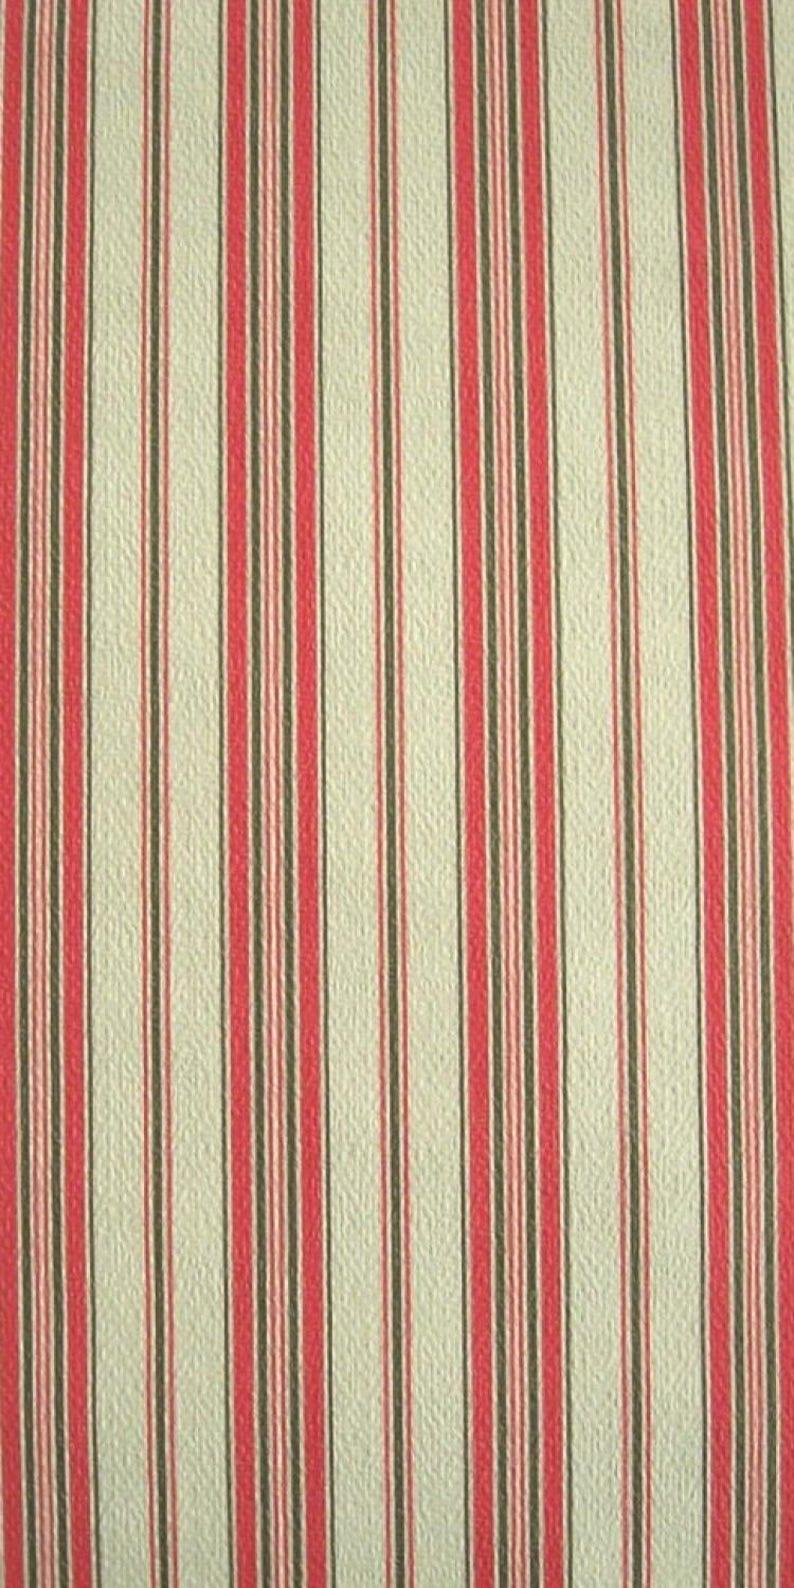 Vintage Wallpaper Pyjama per meter